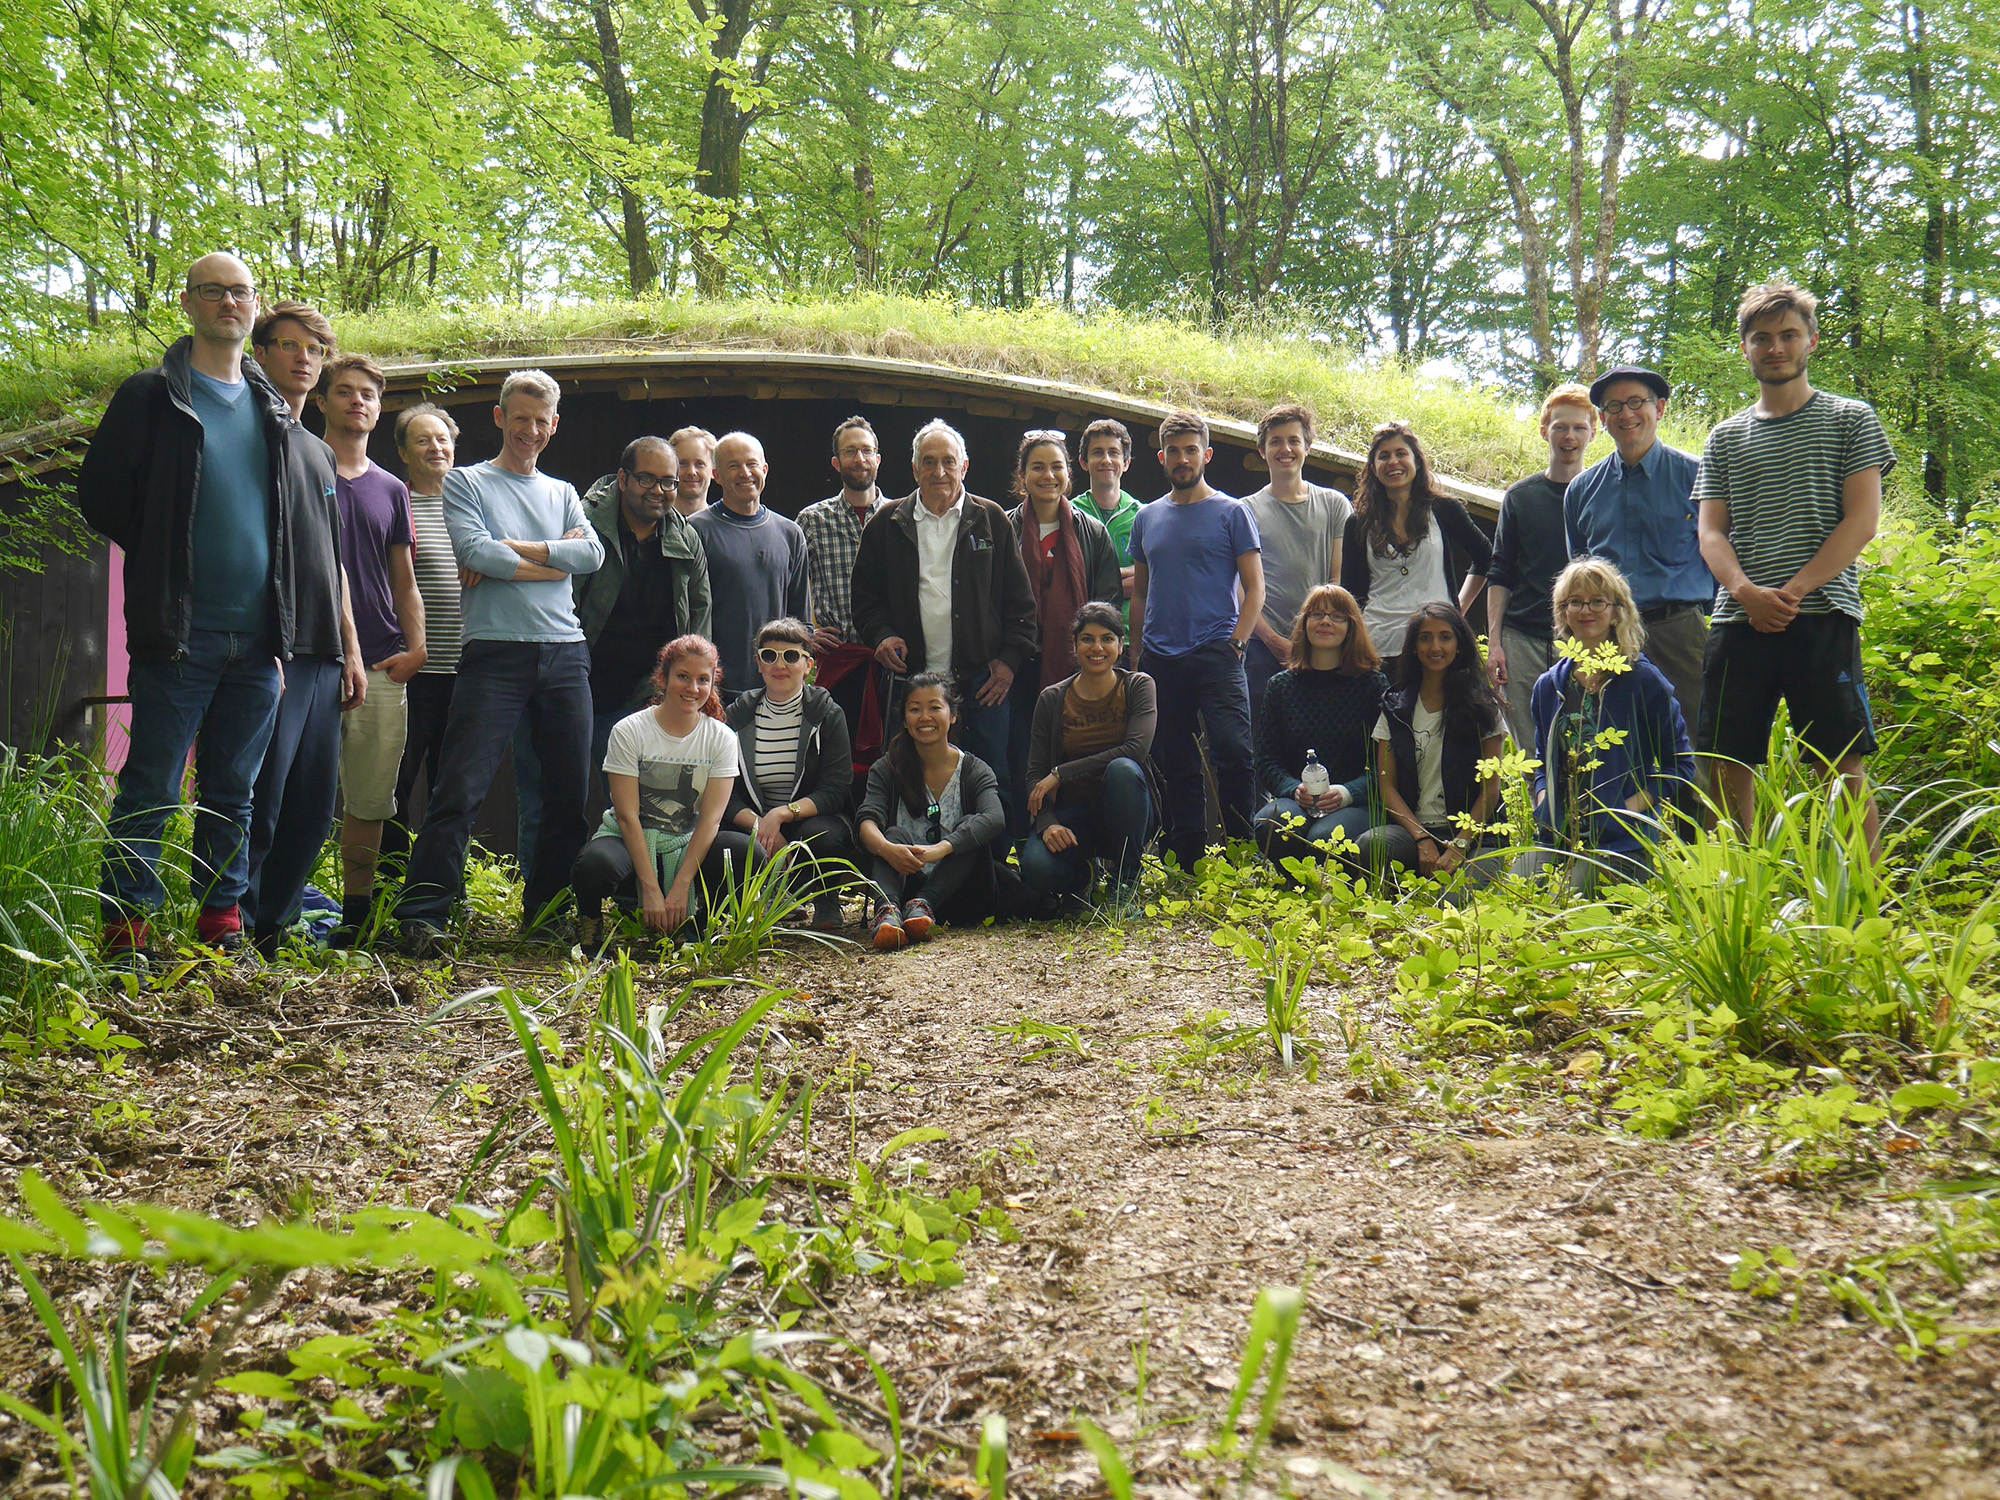 Cullinan Studio visit to Hooke Park